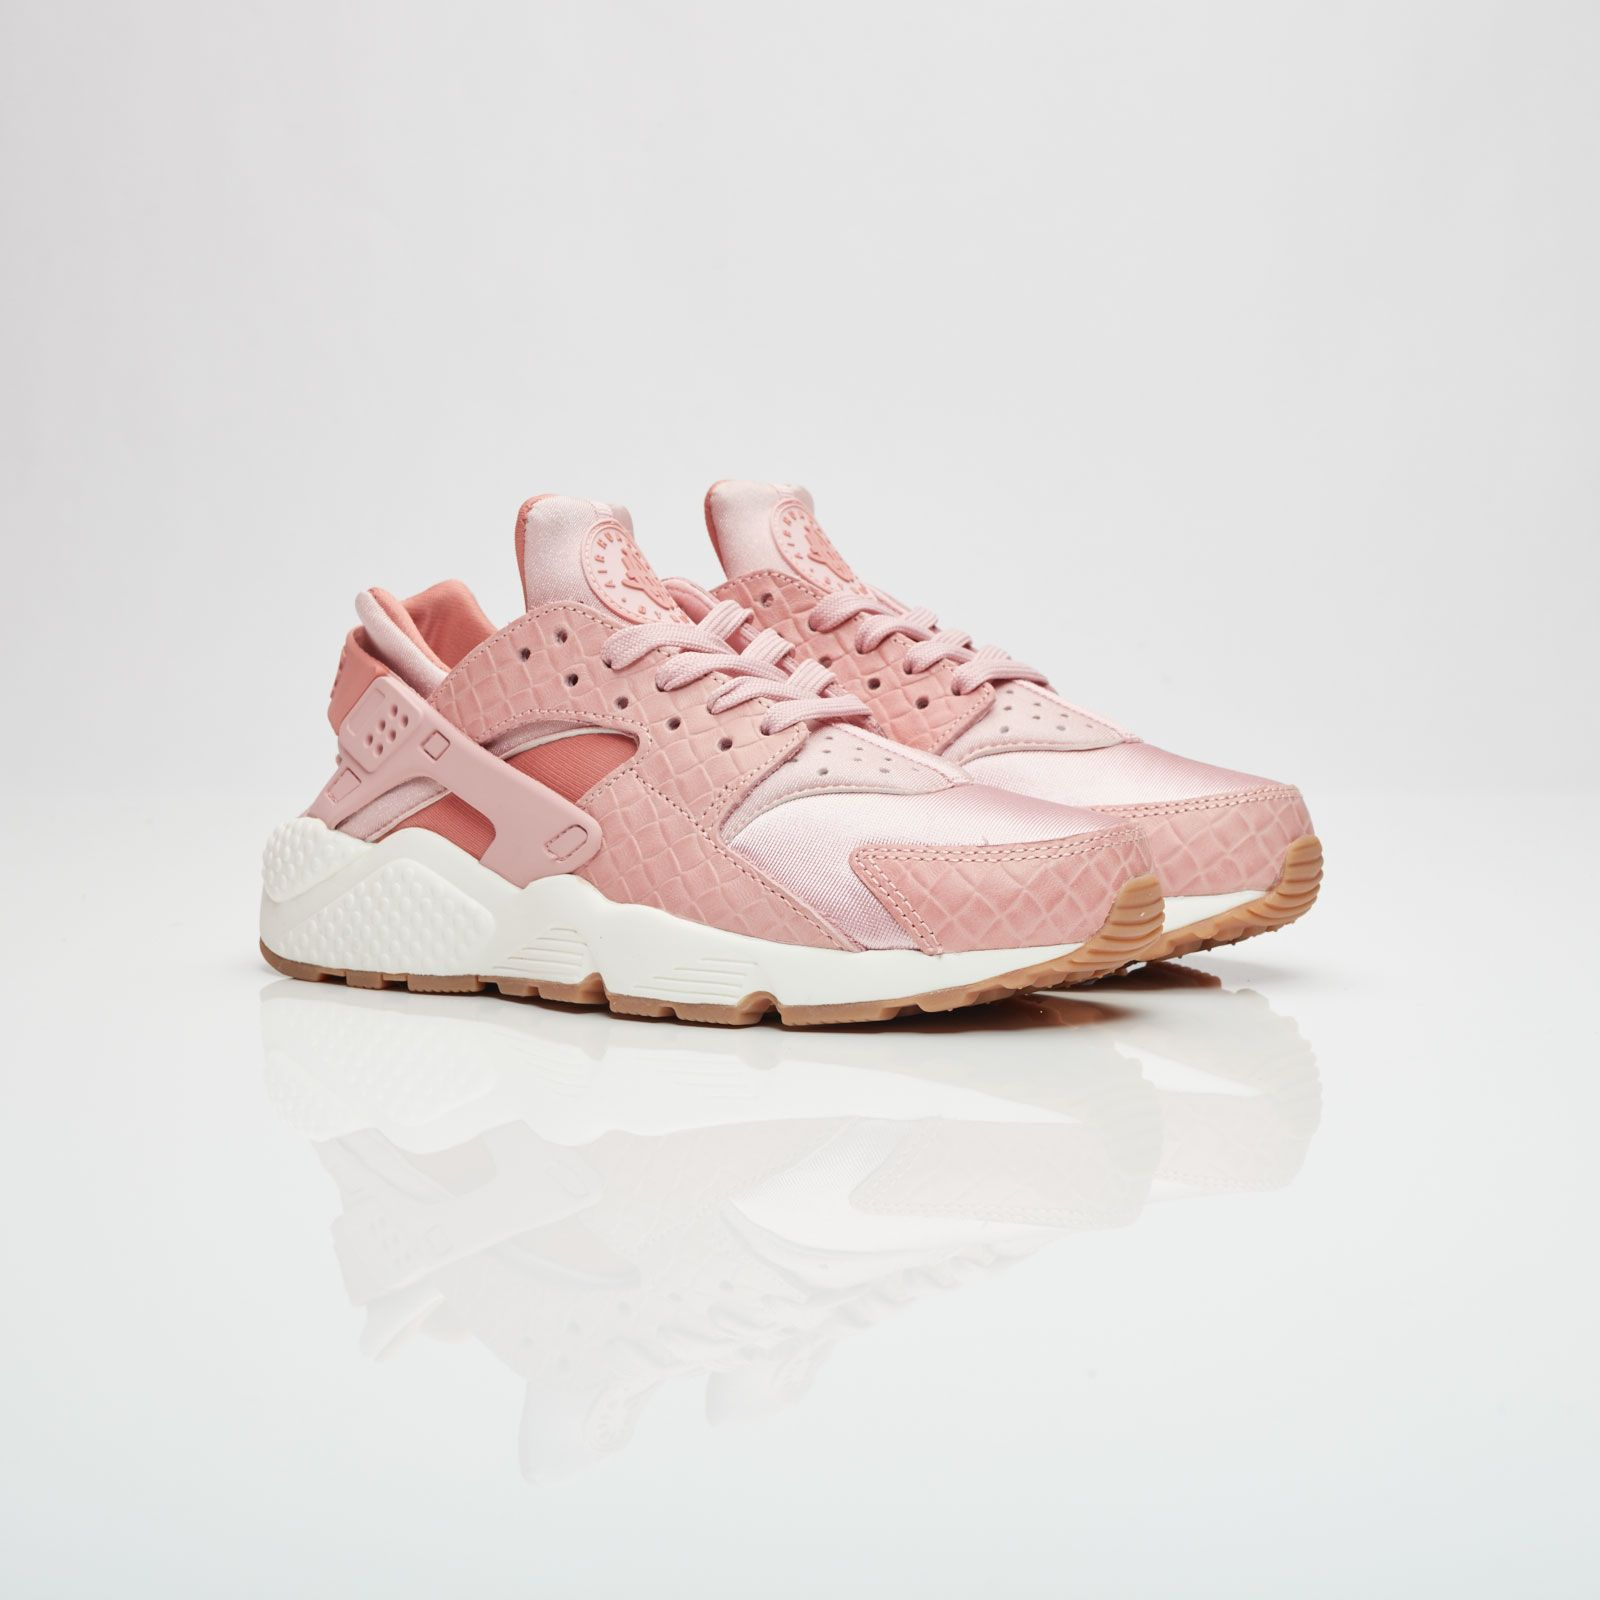 Nike Wmns Air Huarache Run Premium 683818 601 Sneakersnstuff Sneakers Streetwear Online Since 1999 Sneakers Huarache Run Huaraches